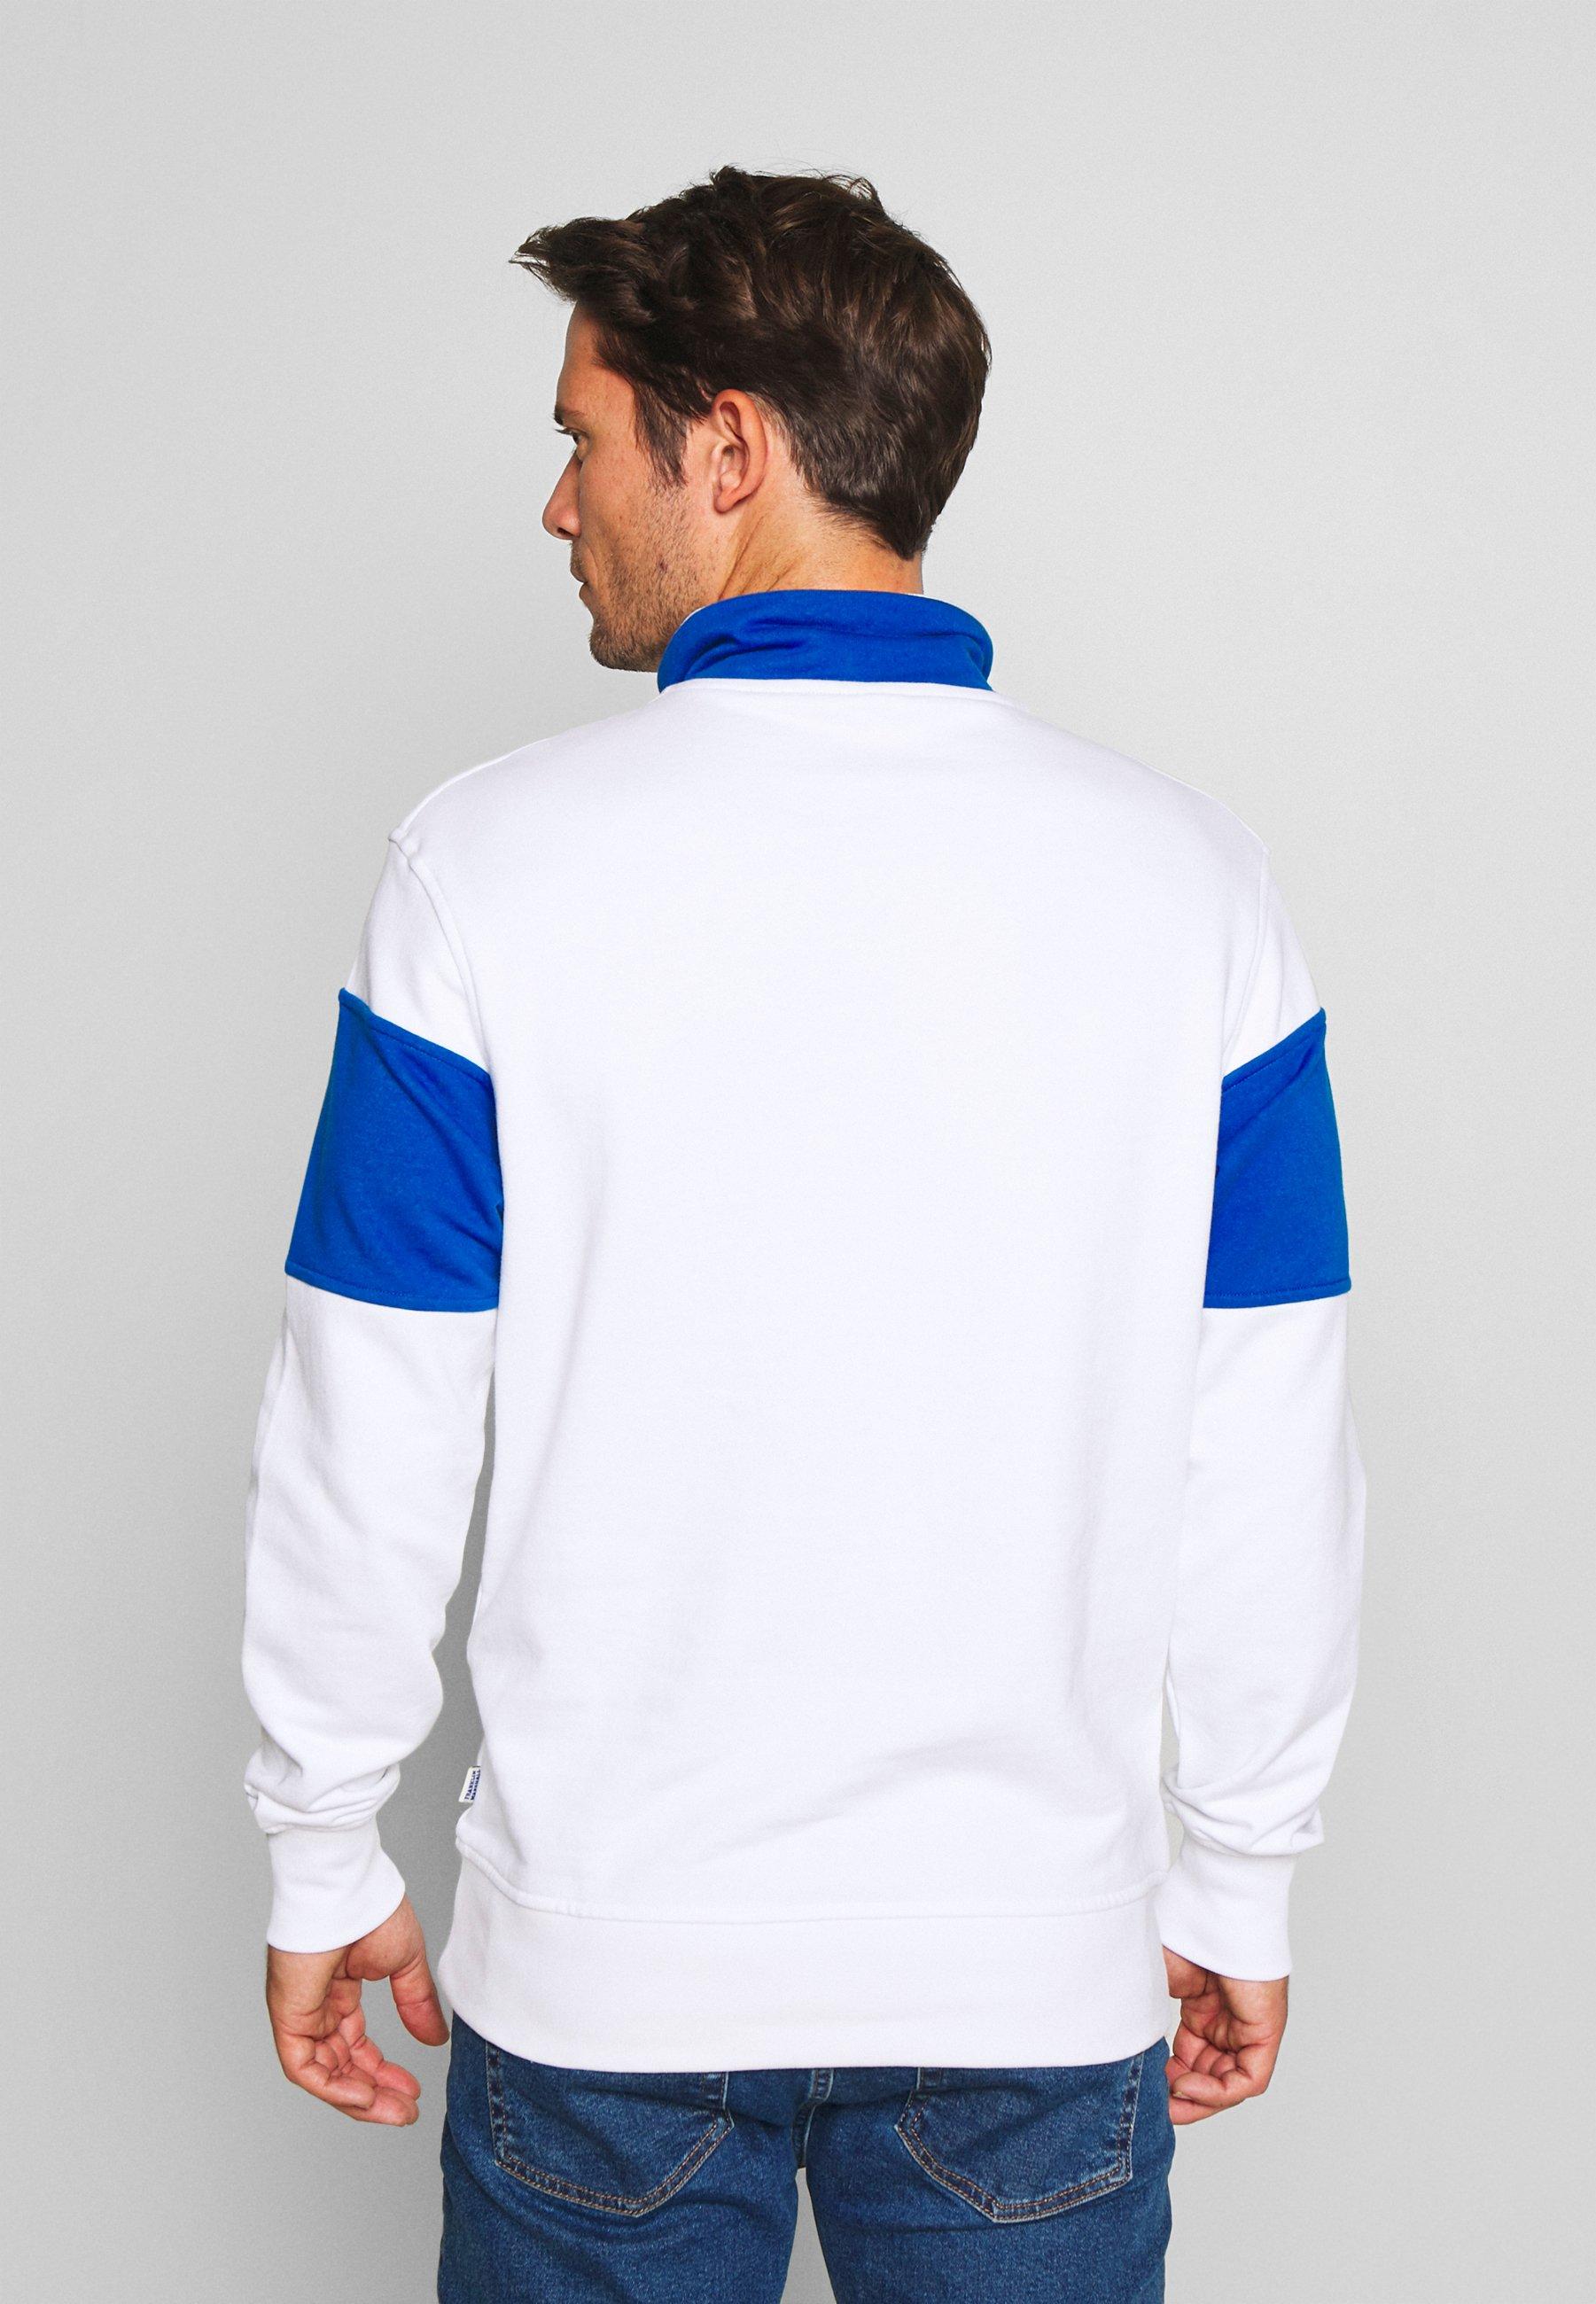 Franklin & Marshall Sweatshirt - block color white